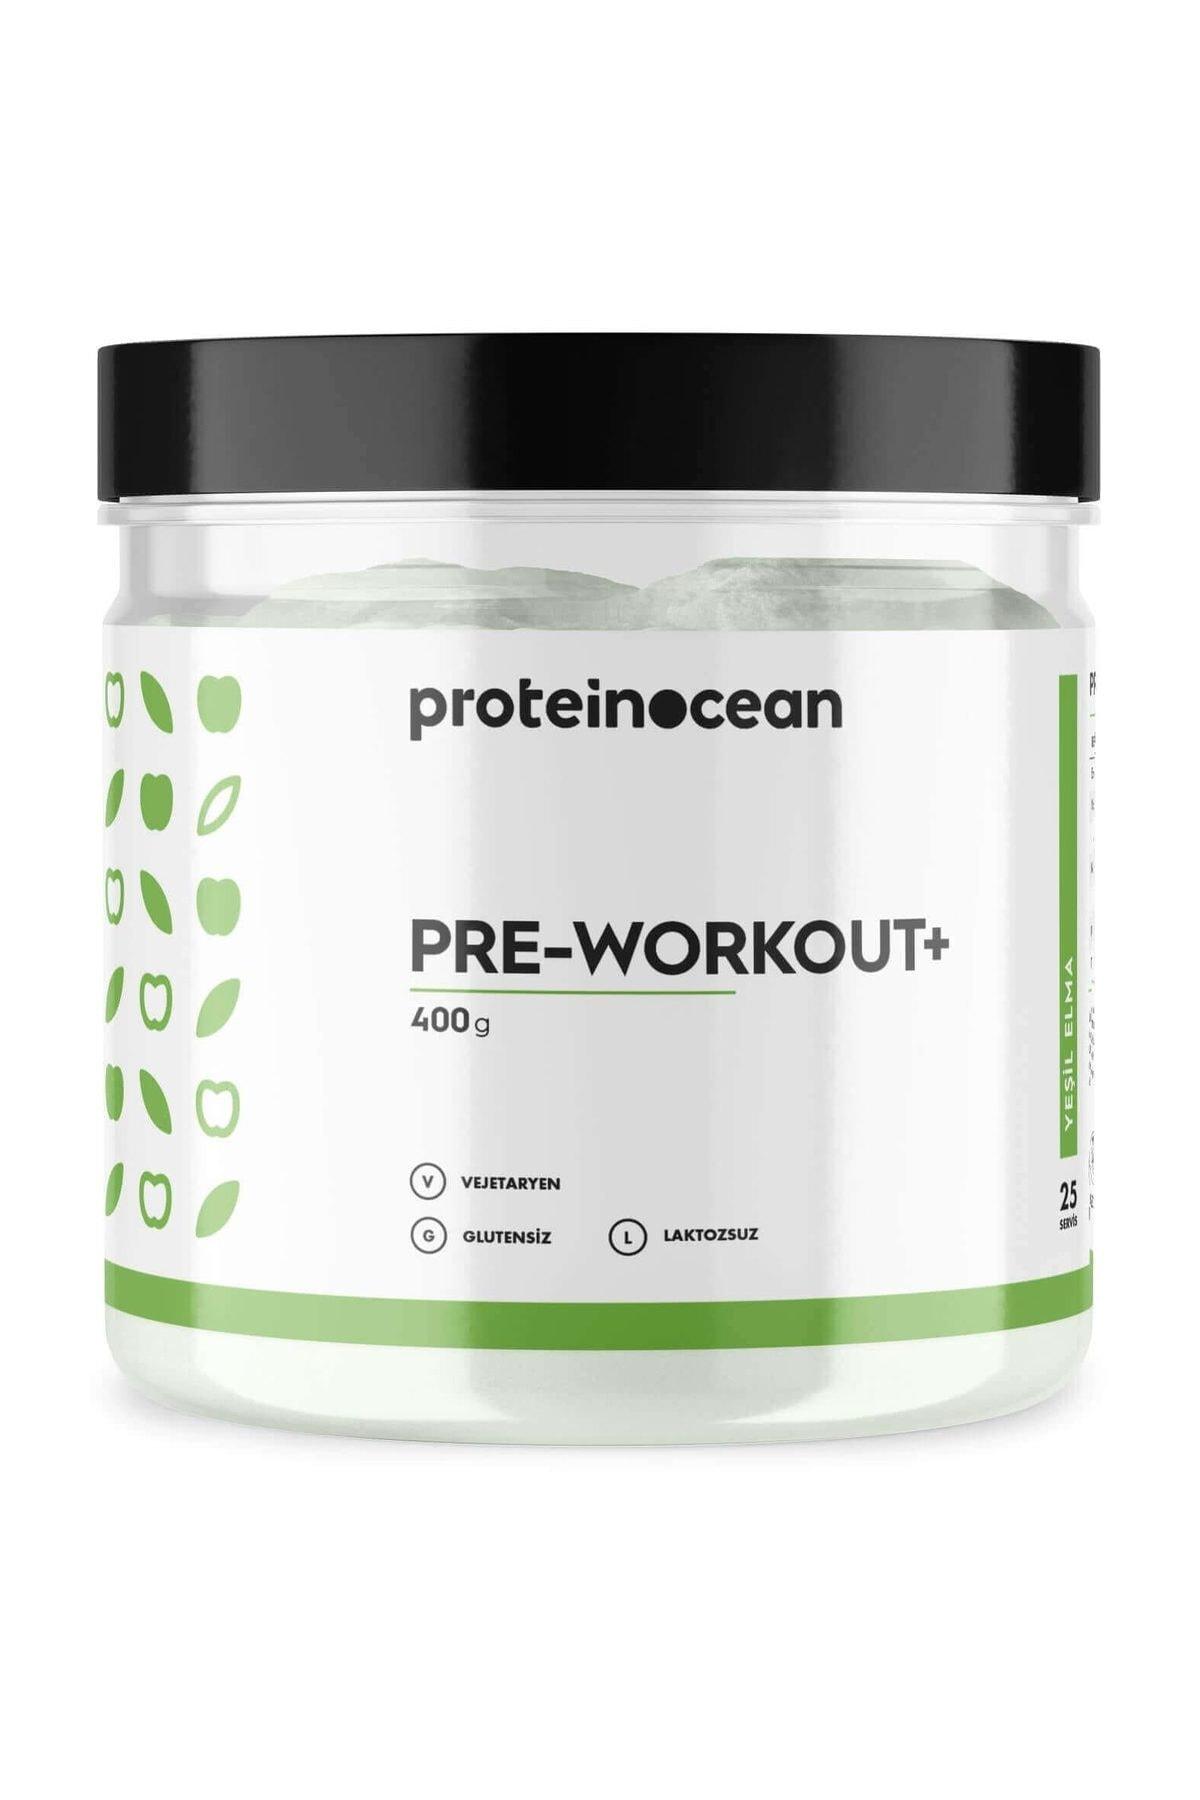 PROTEİNOCEAN Pre-workout+™ Yeşil Elma 400g - 25 Servis 1